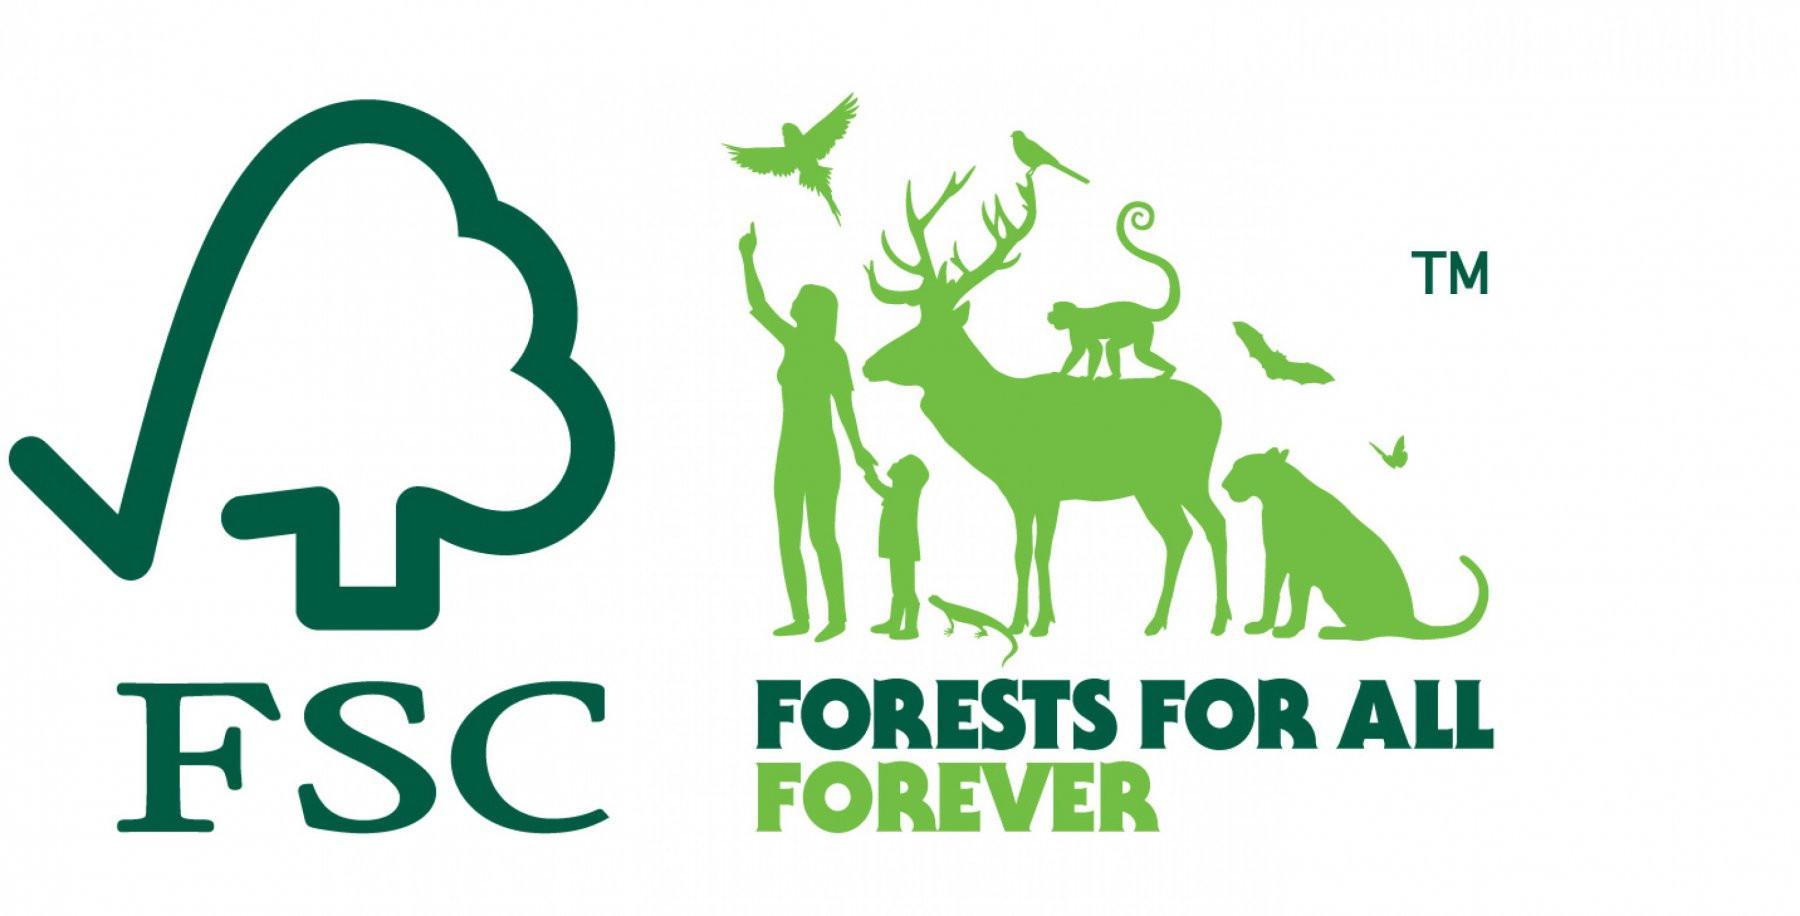 Forest Stewardship Council (FSC)